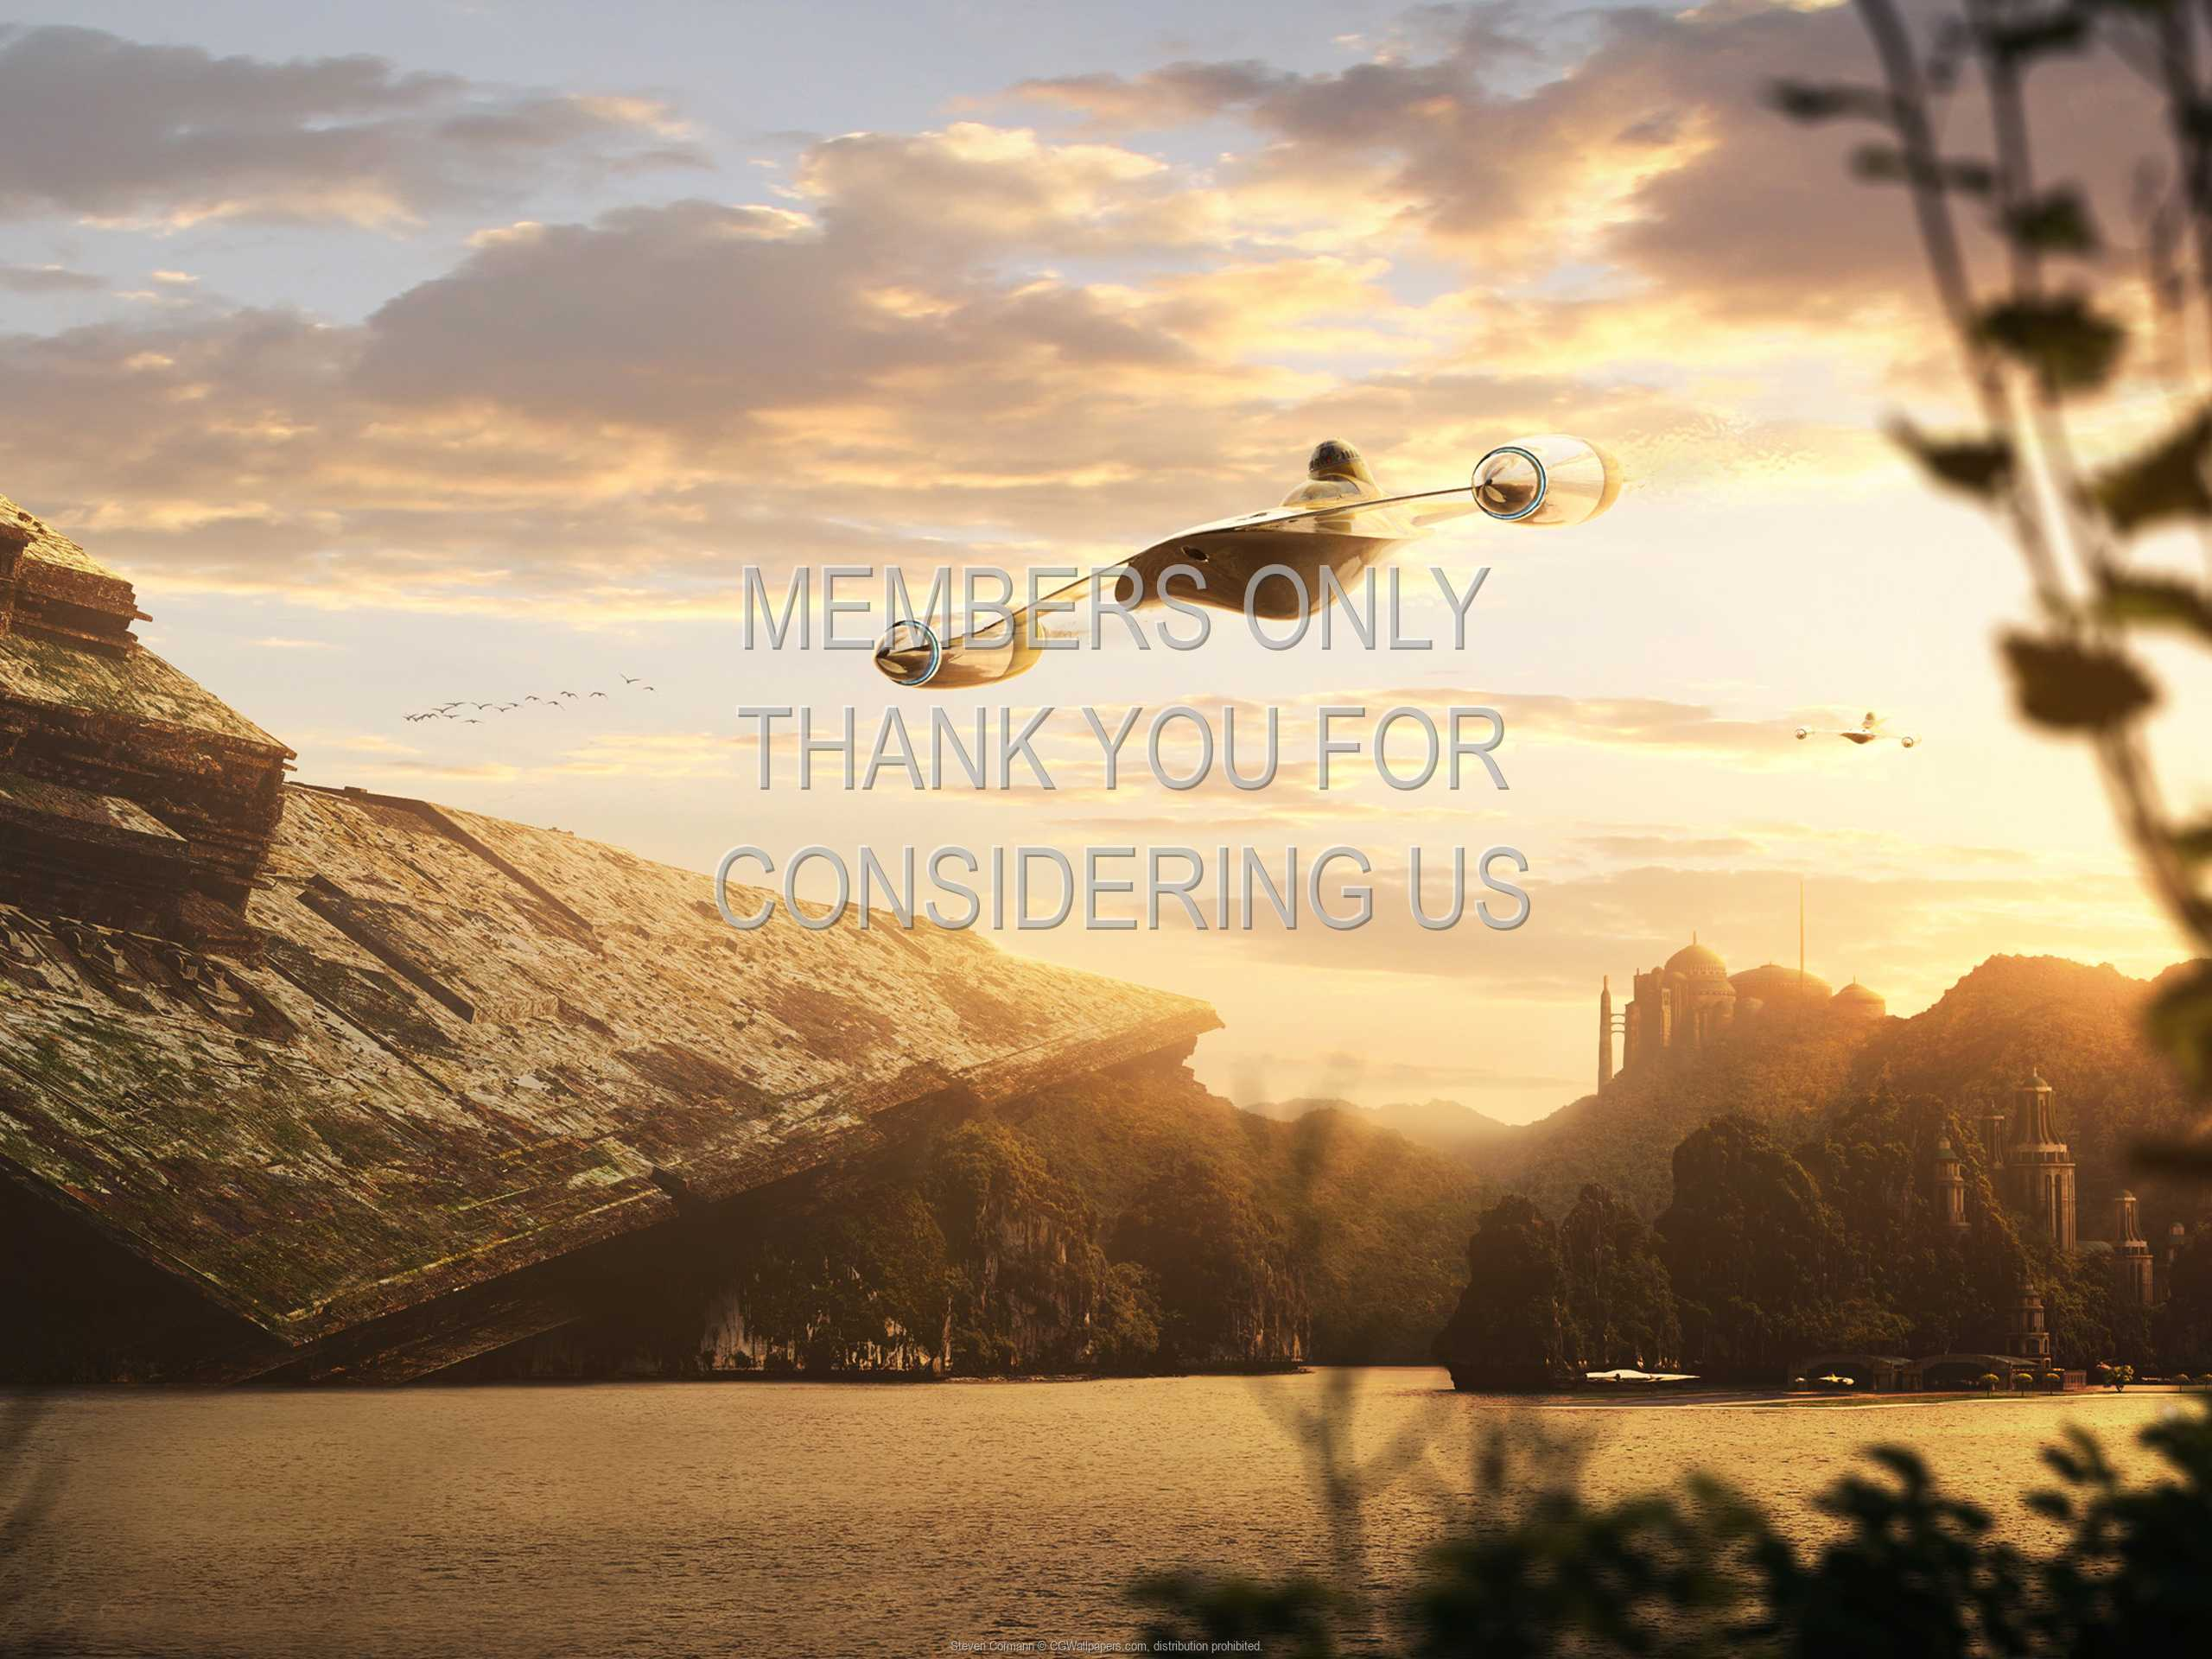 Steven Cormann 1080p Horizontal Mobiele achtergrond 01